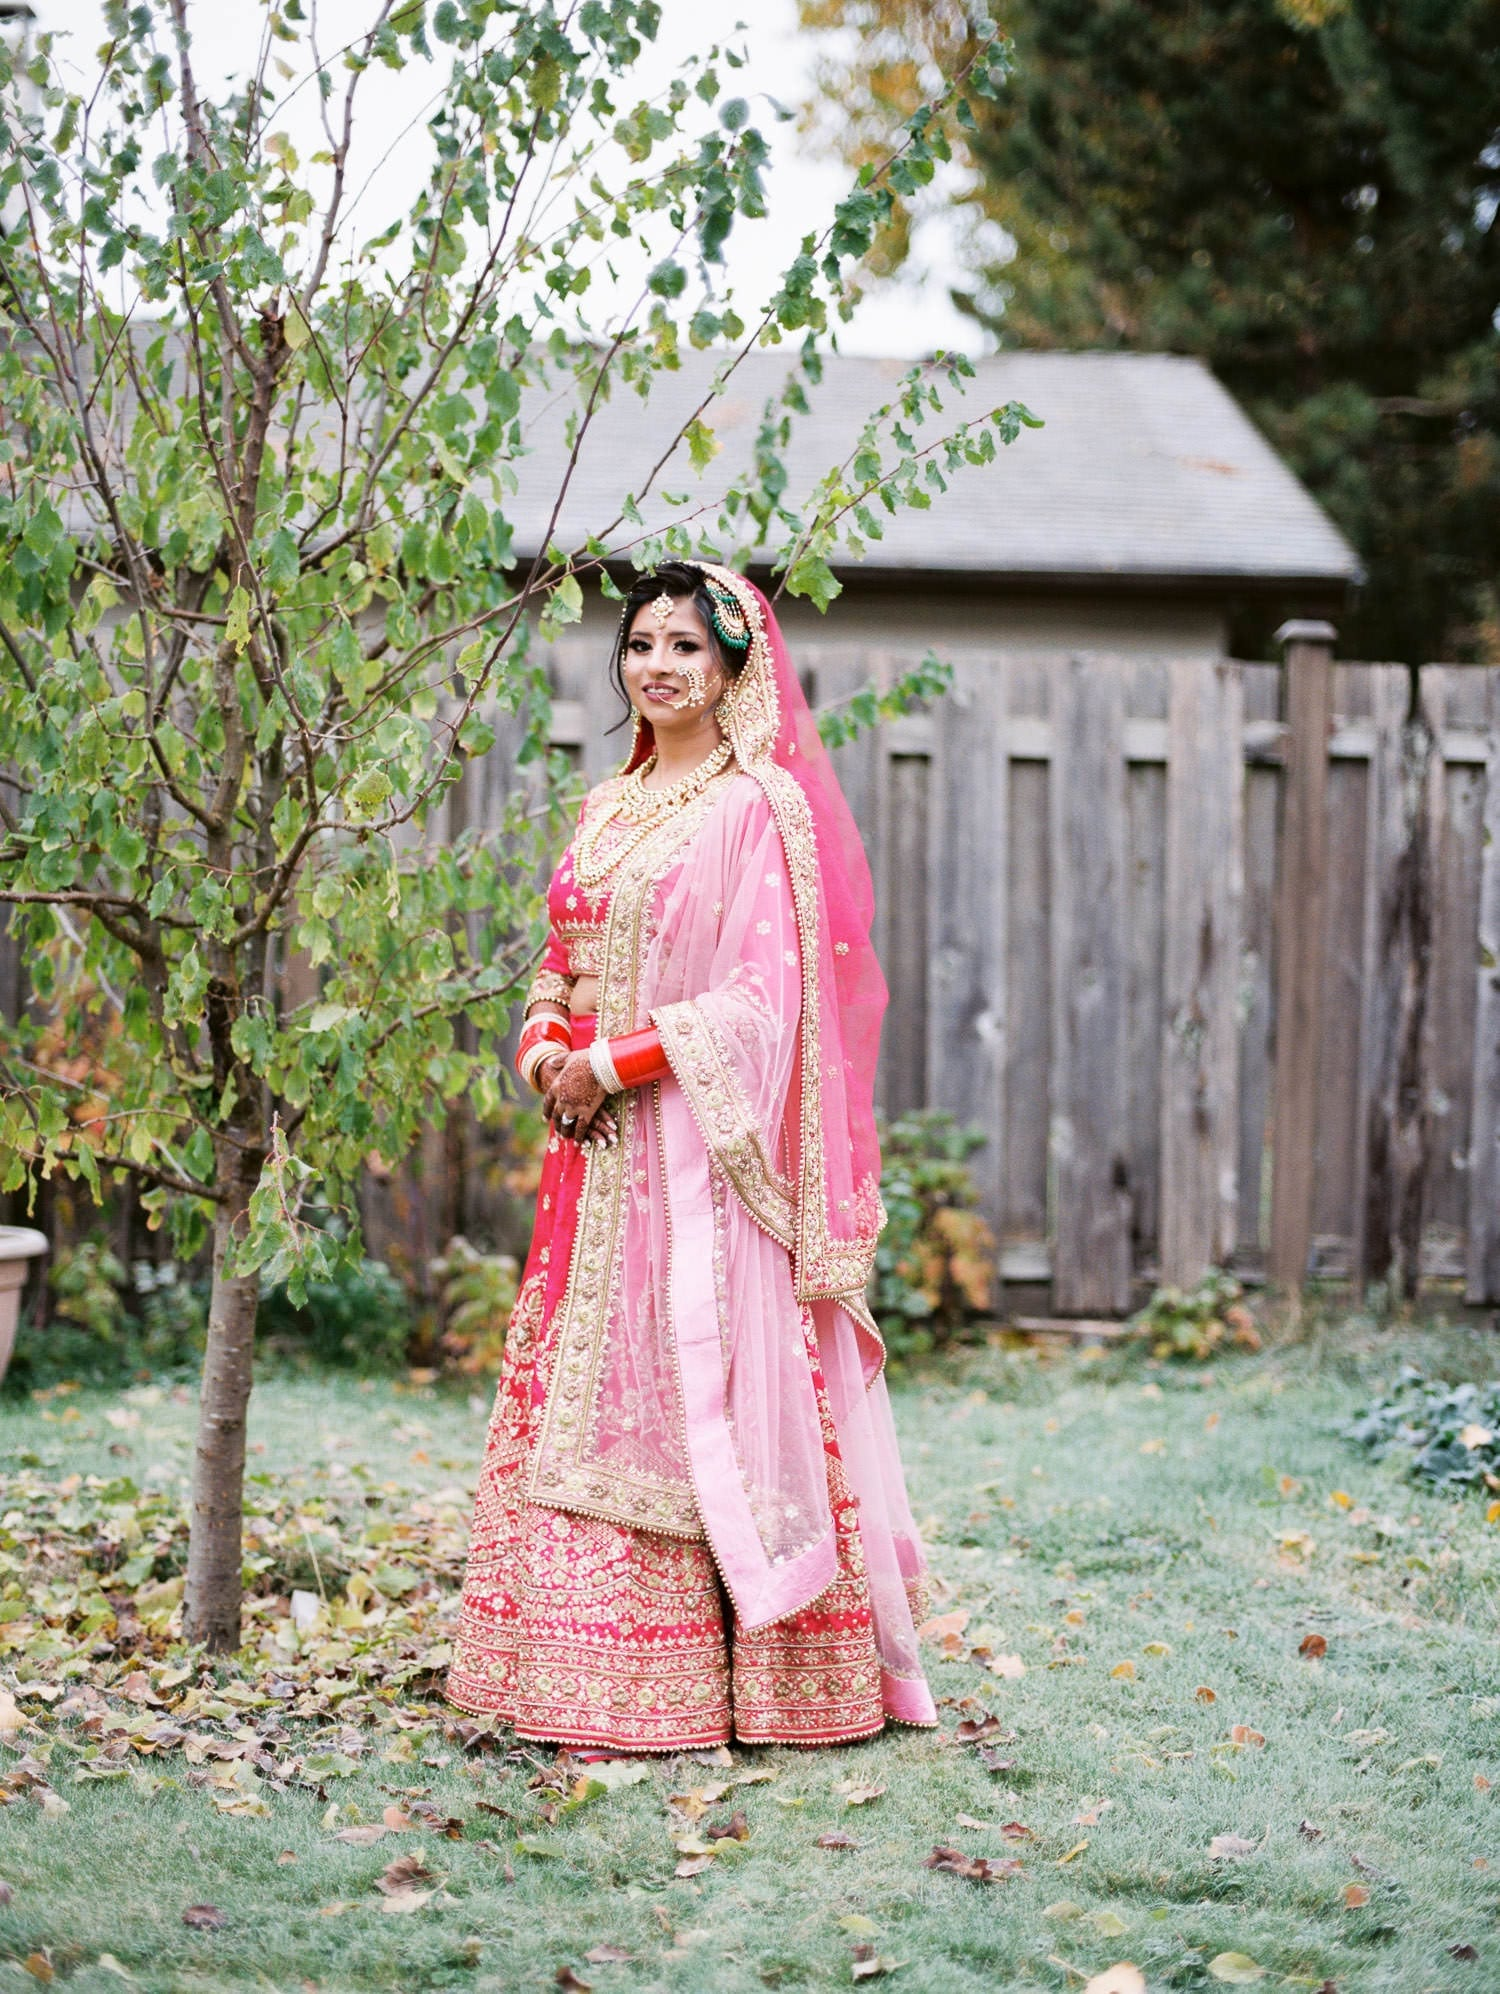 indian bride and groom photo in Minoru park